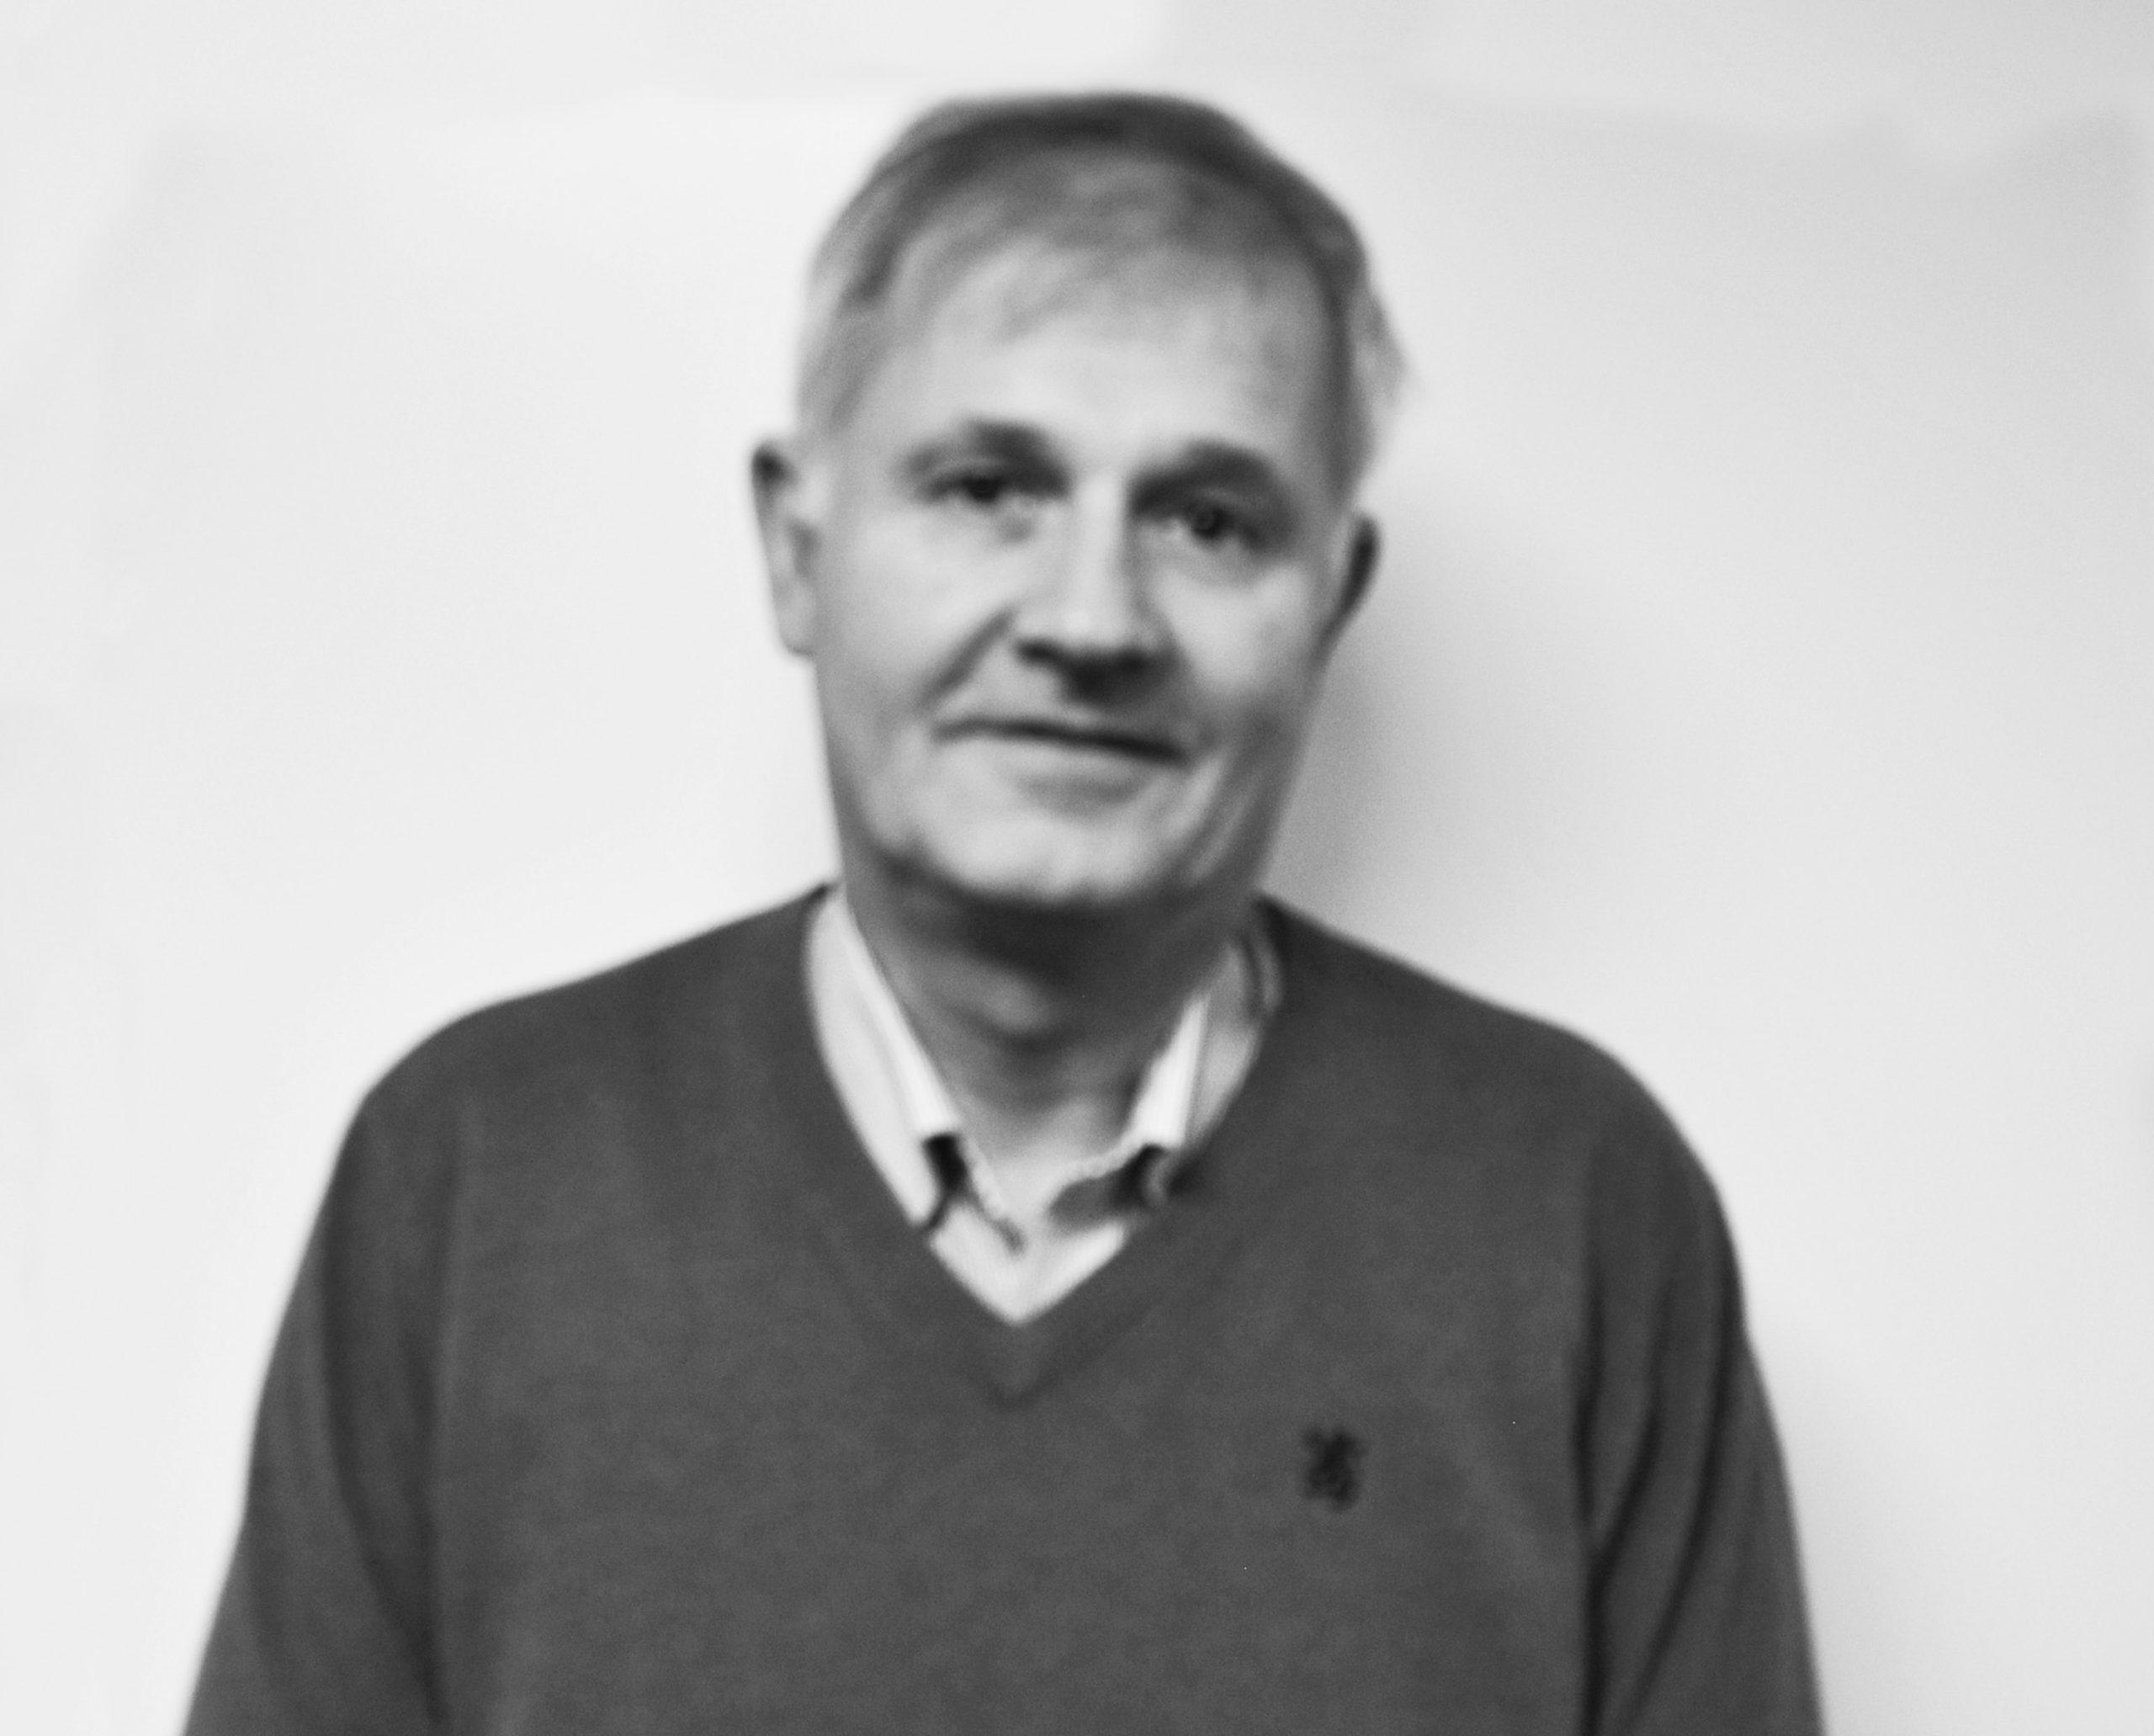 Ole Petter Løvberg